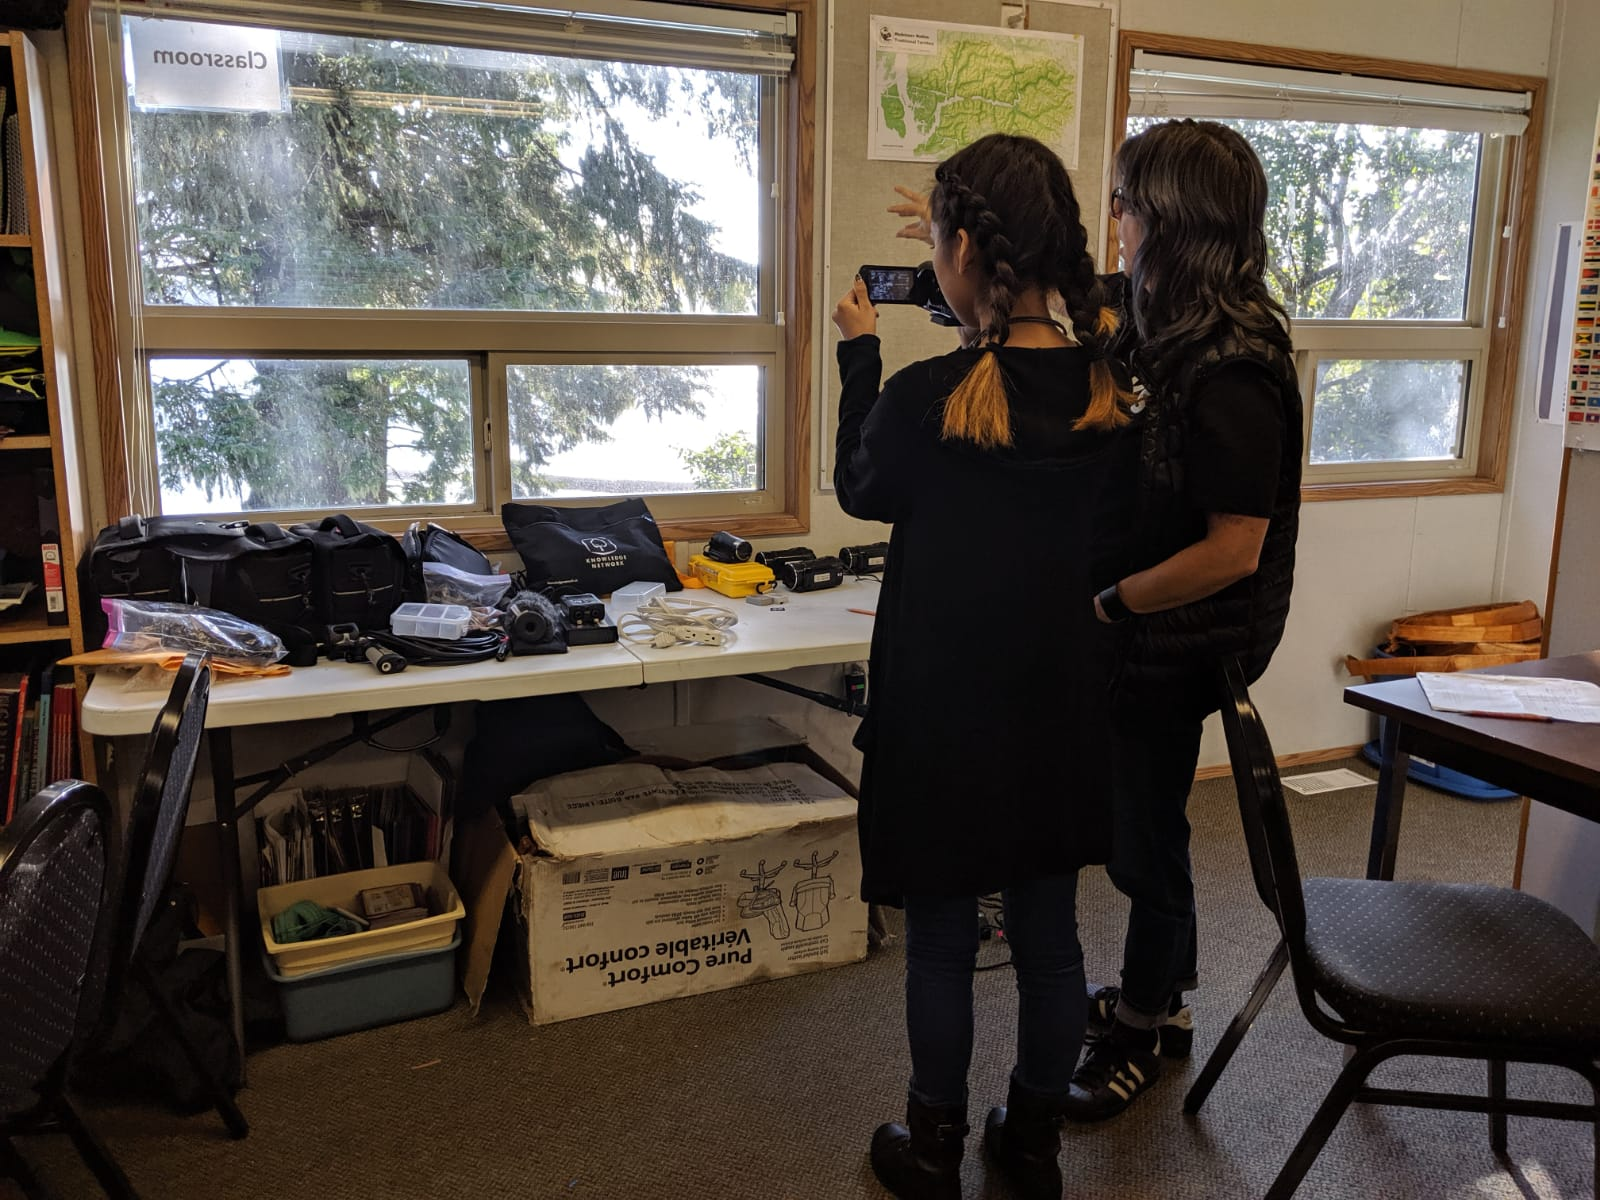 Lisa shows Shandi the vixia camera